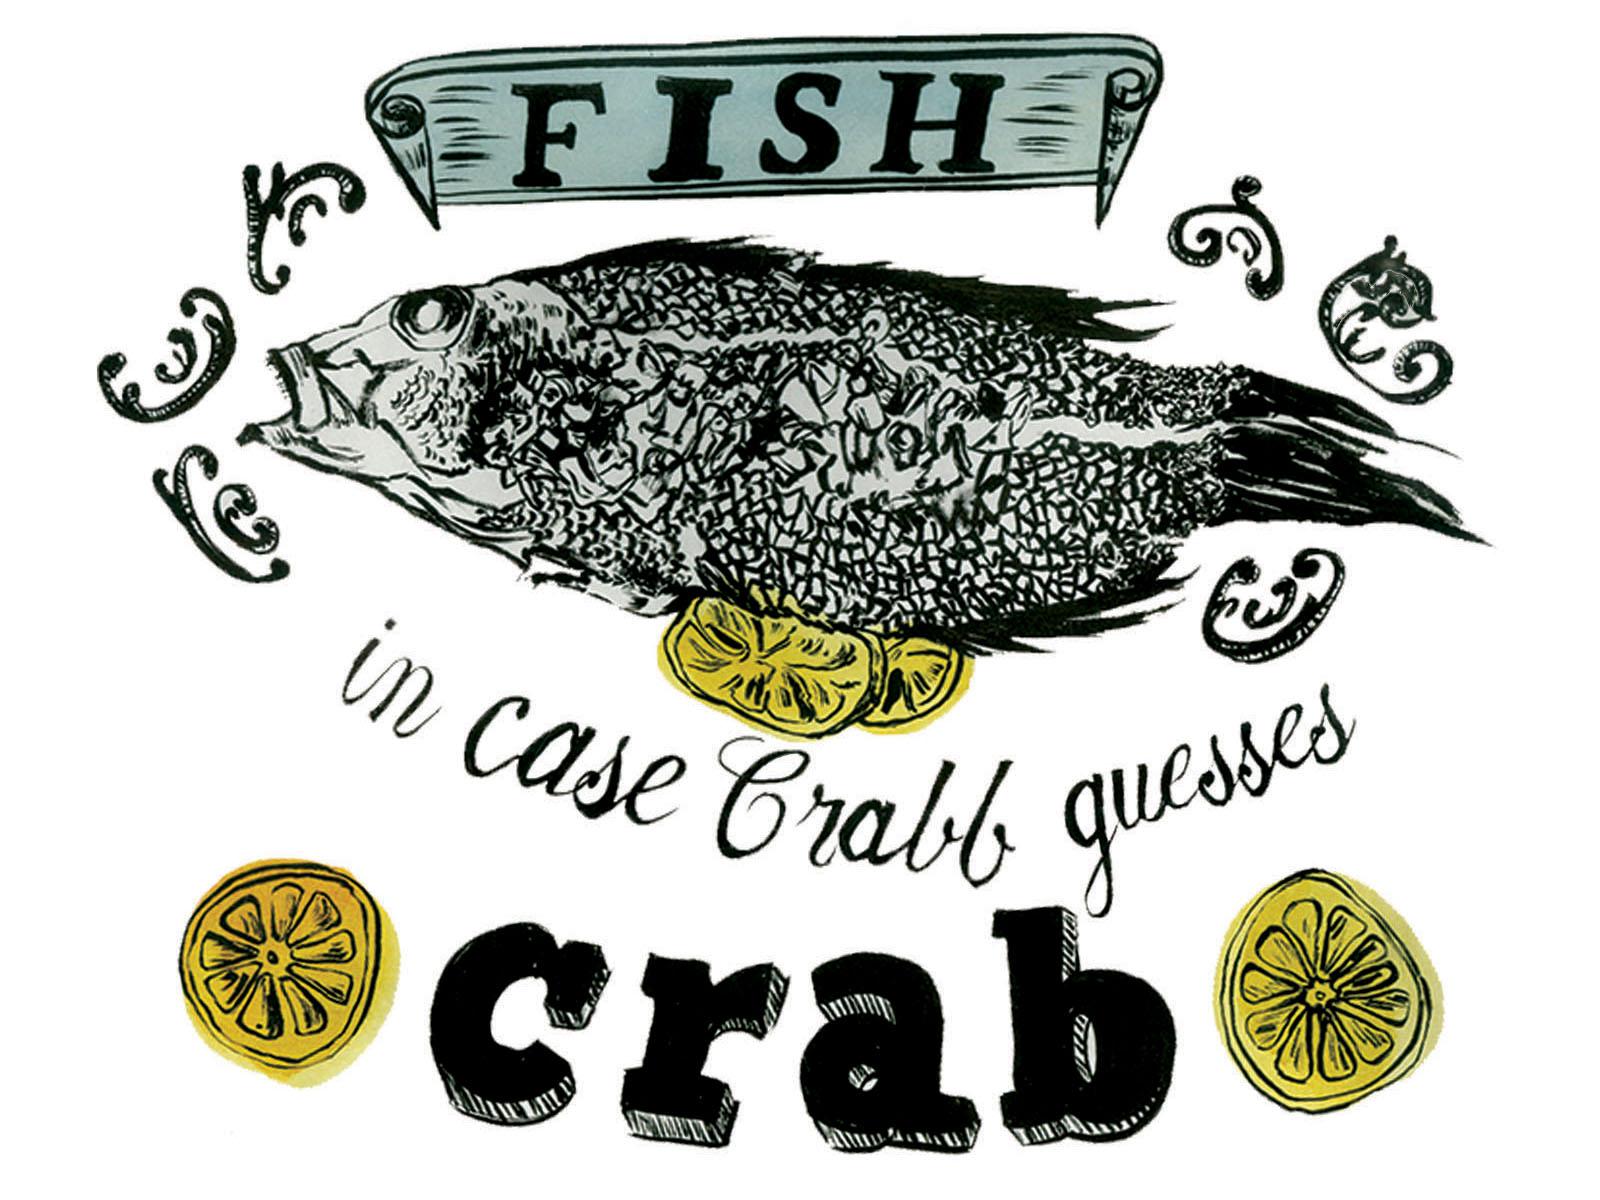 1 fish.jpg